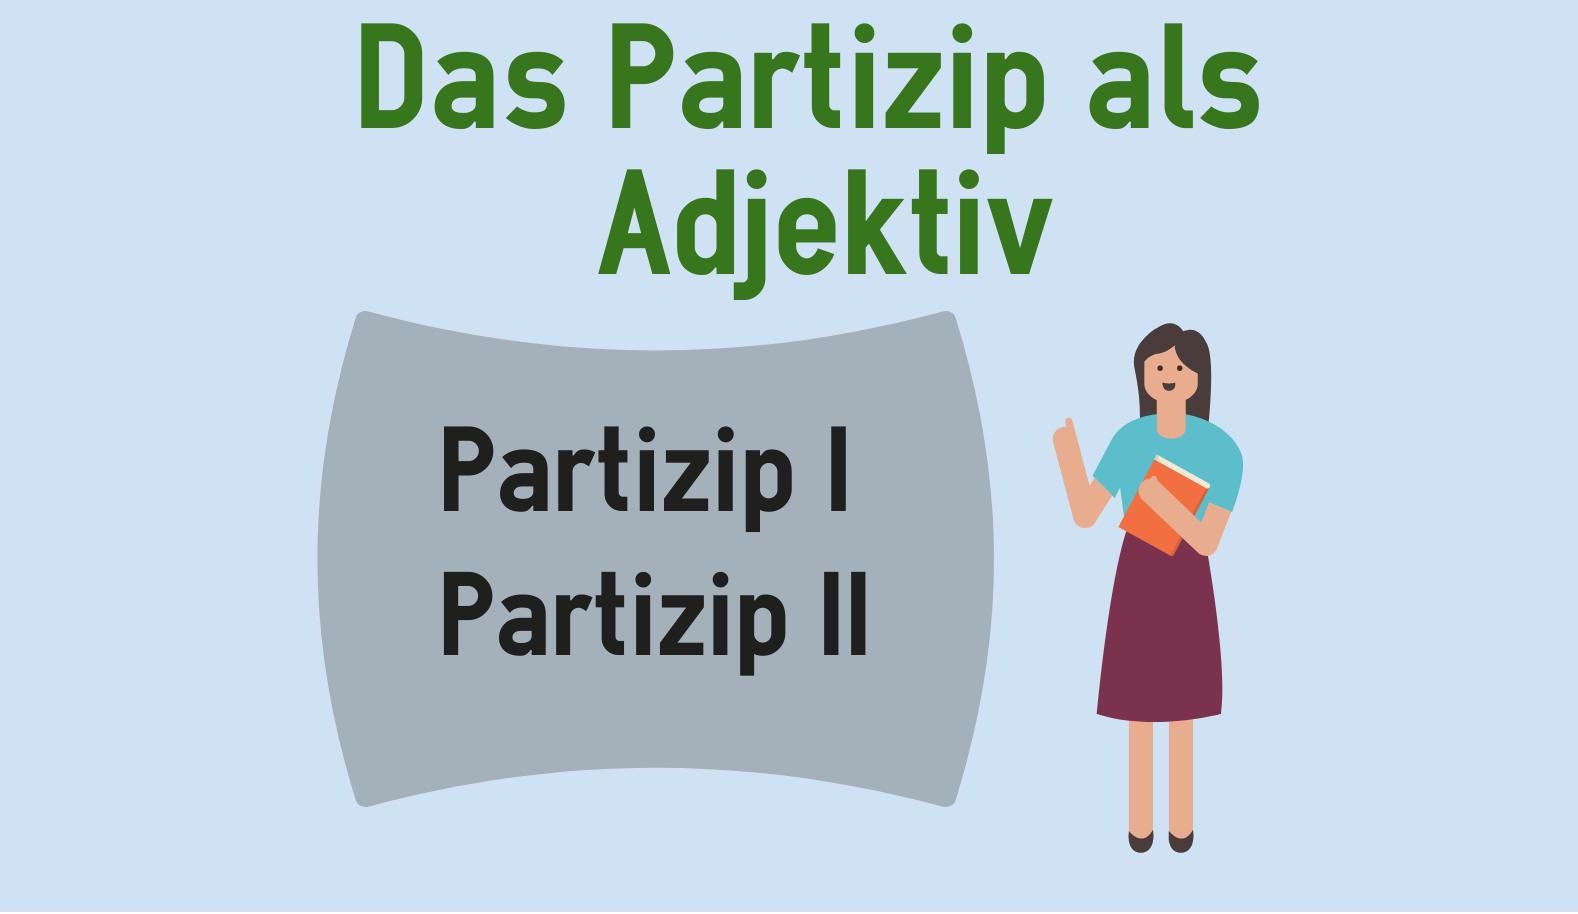 Das Partizip als Adjektiv